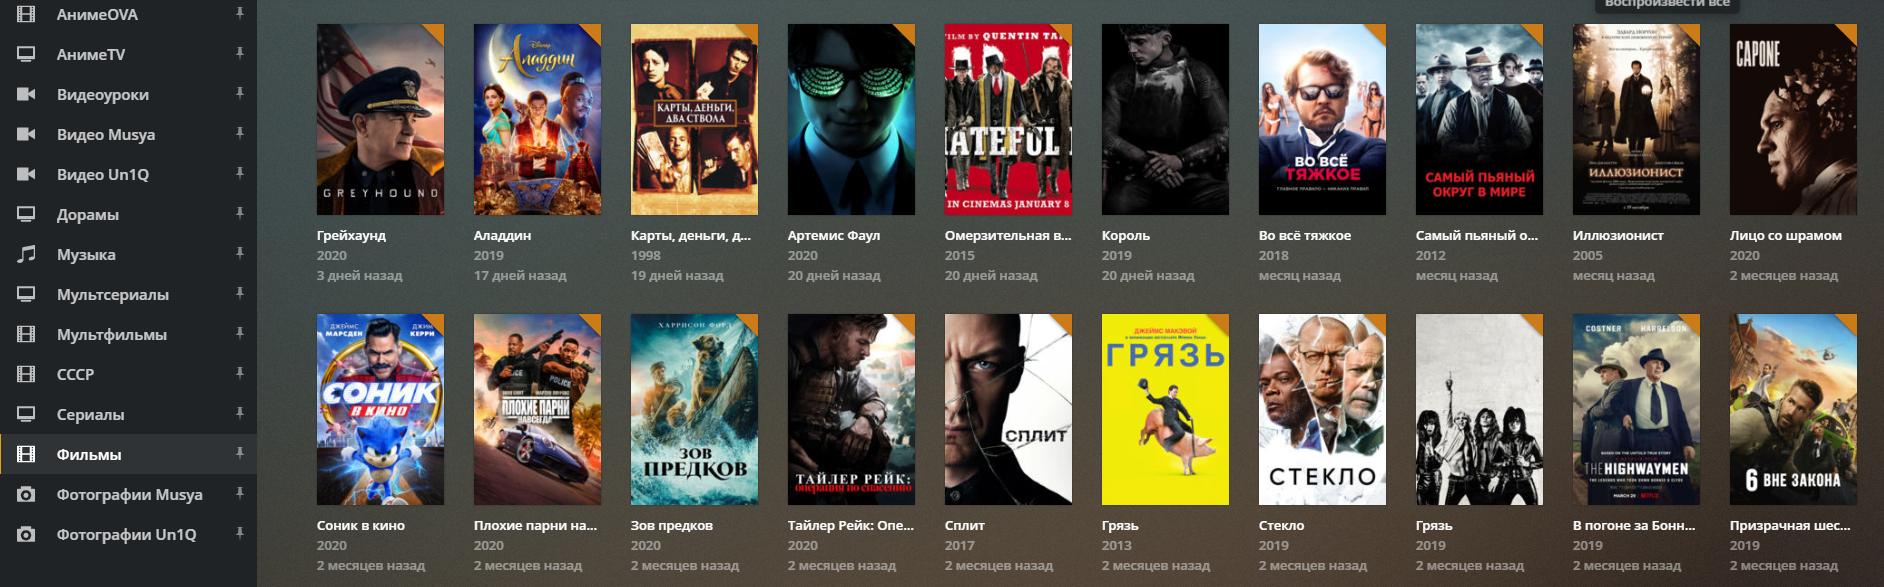 Plex – установка домашнего медиа сервера на Unraid 6.8.3 61